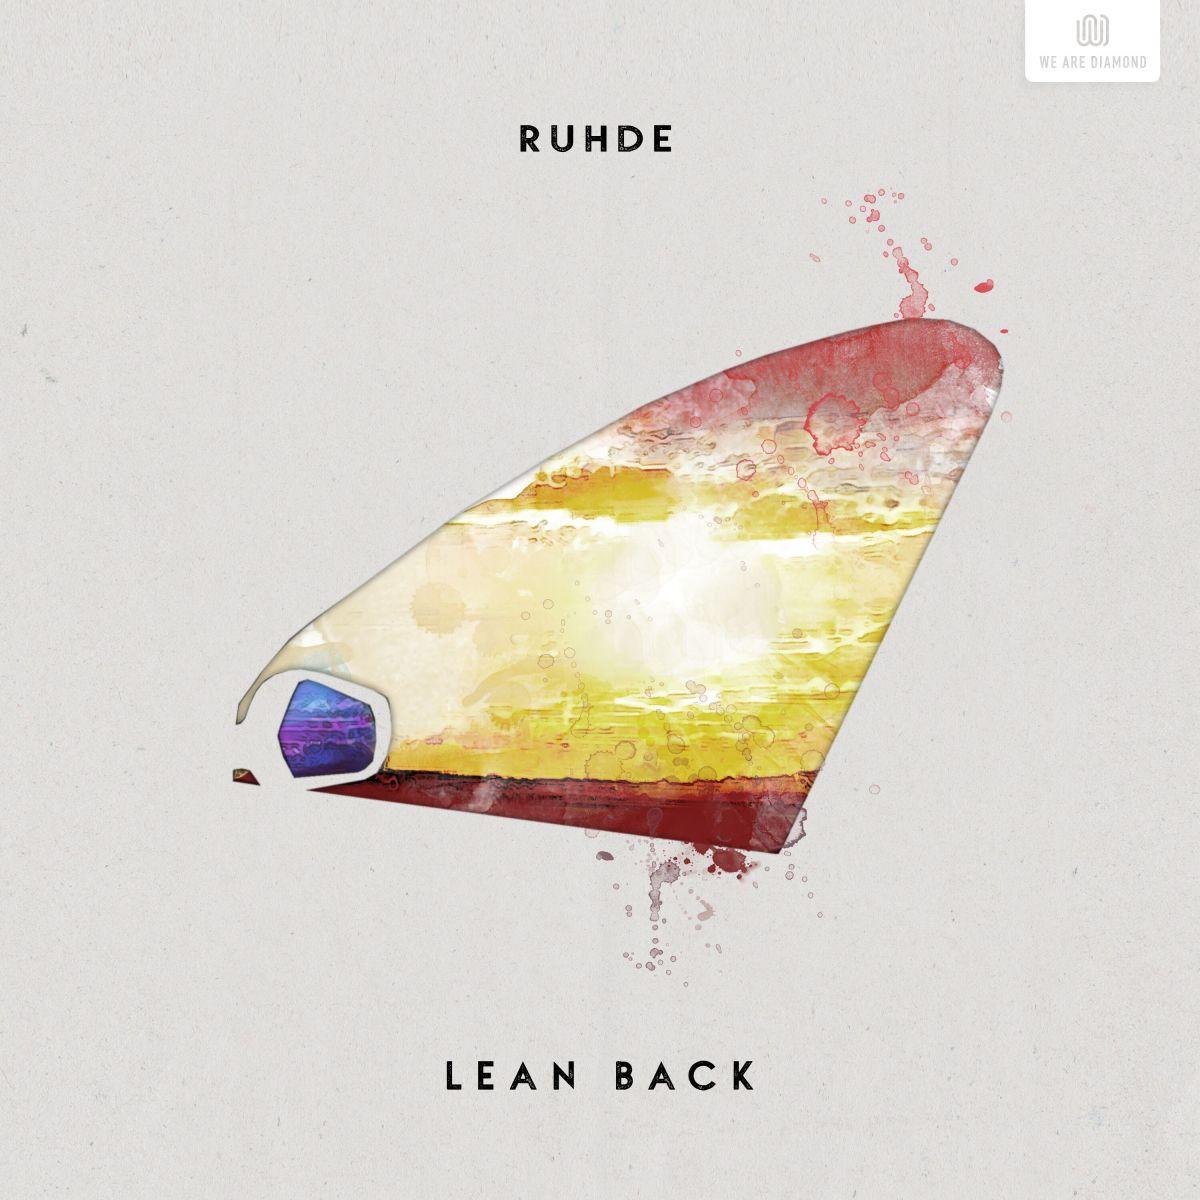 Ruhde Lean Back Album Art